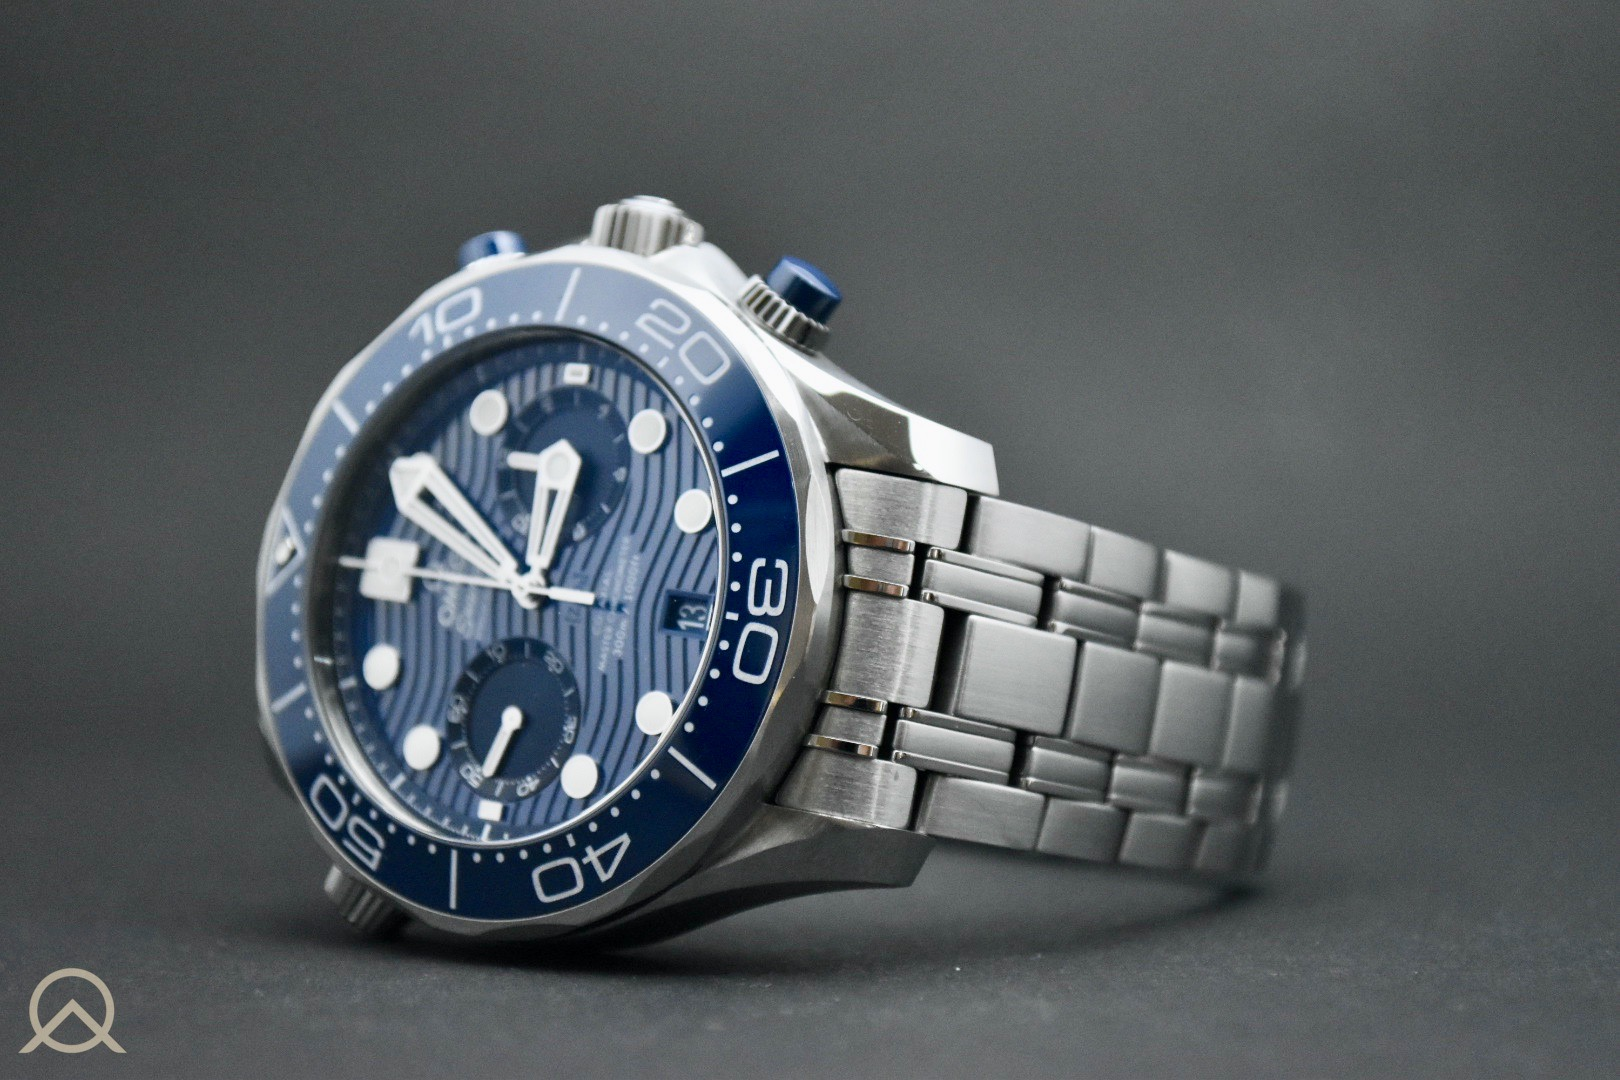 Omega Seamaster Diver Chrono 300M